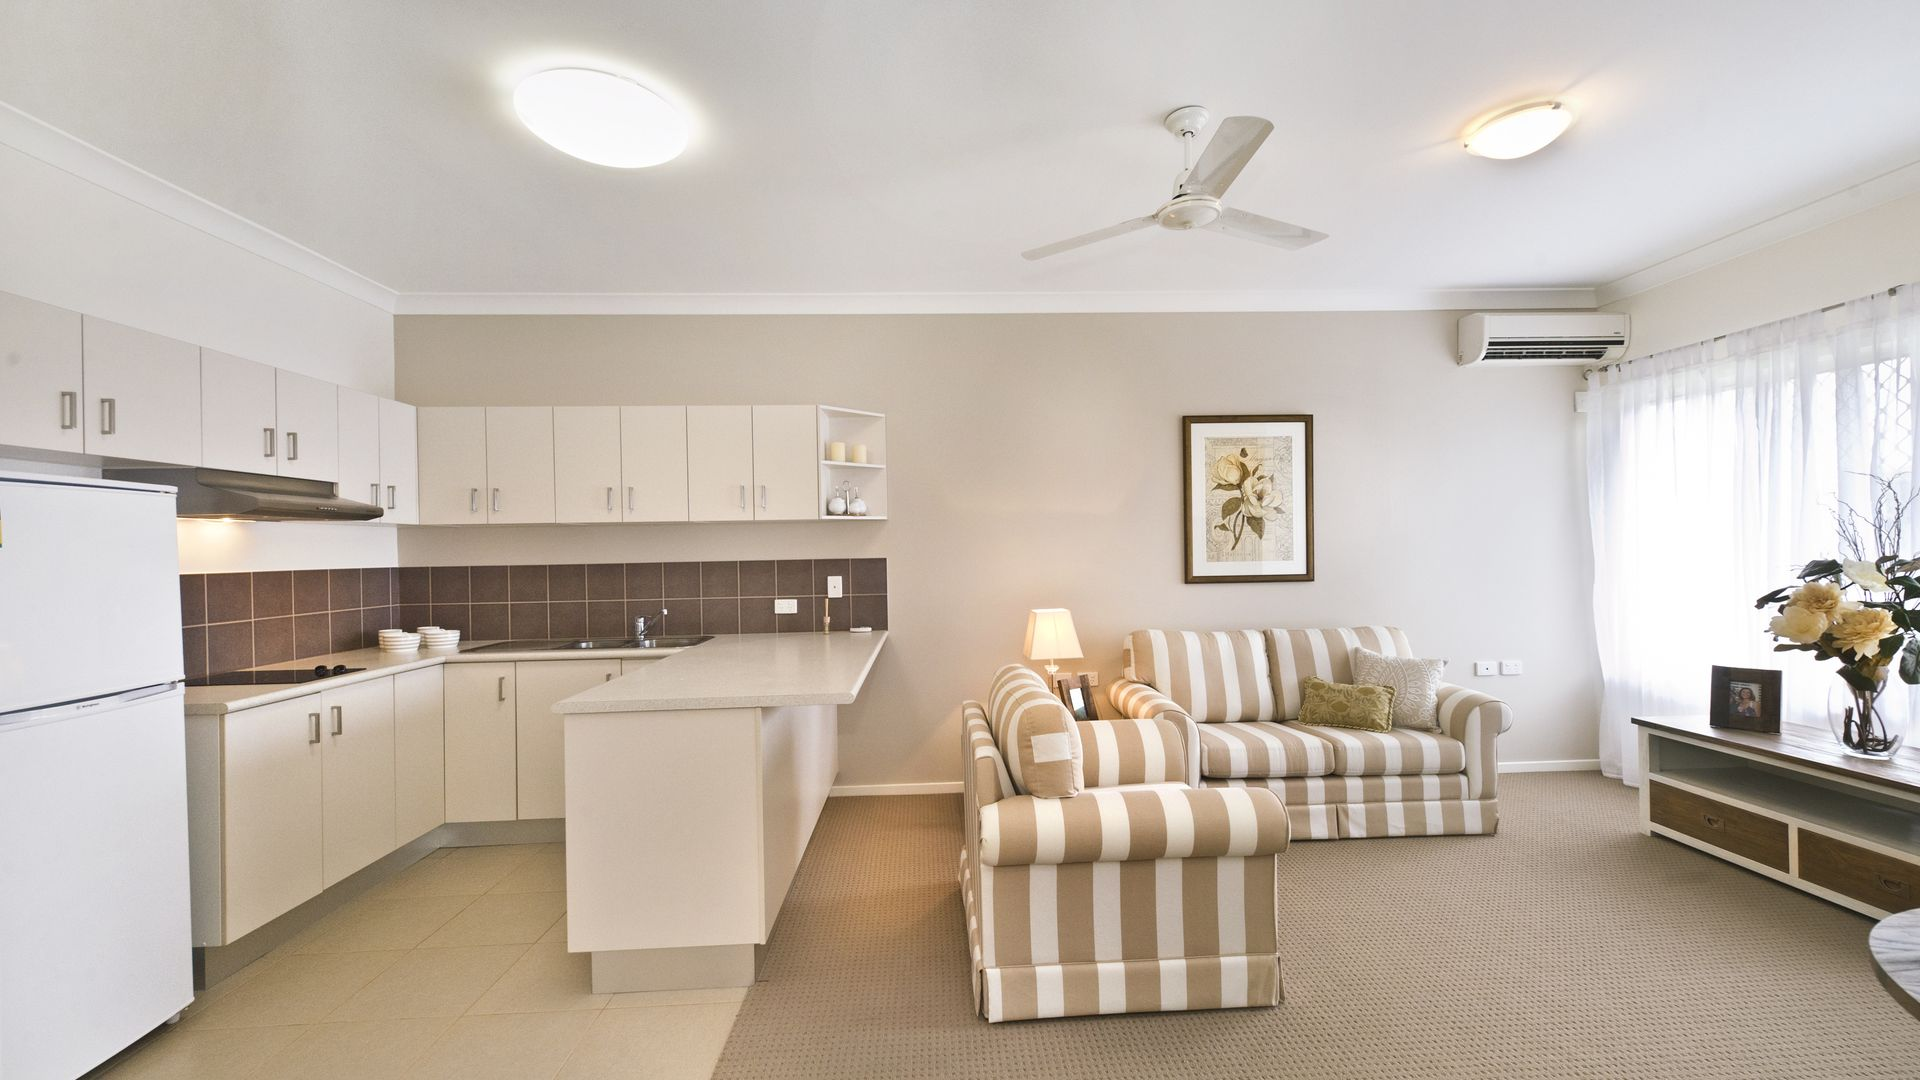 2/14 Pauline Martin Drive, Rockhampton City QLD 4700, Image 1